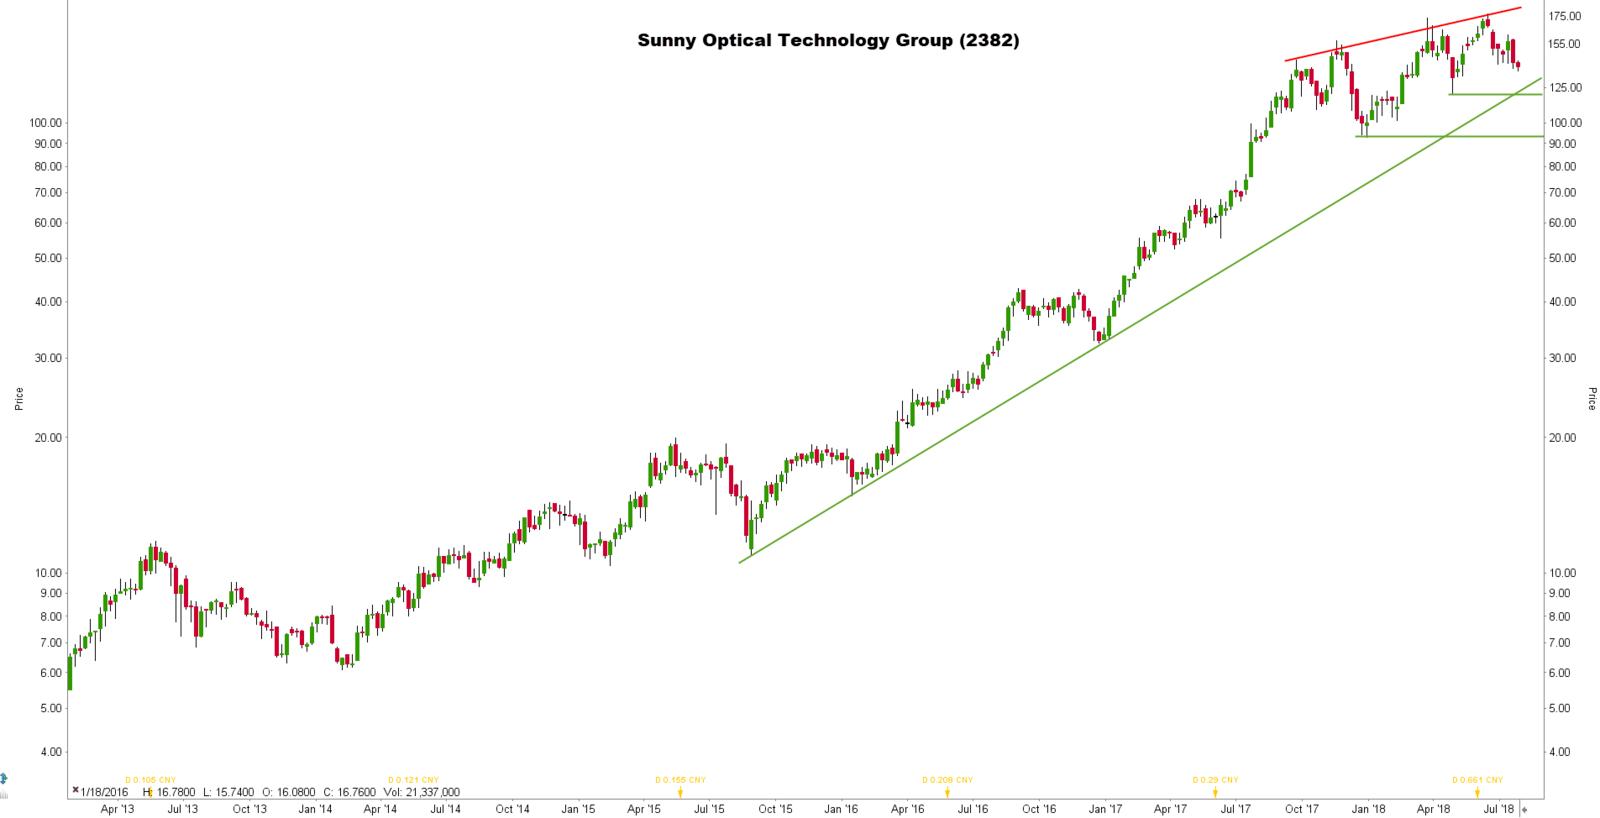 Beste Chinese aandelen: Sunny Optical Technology